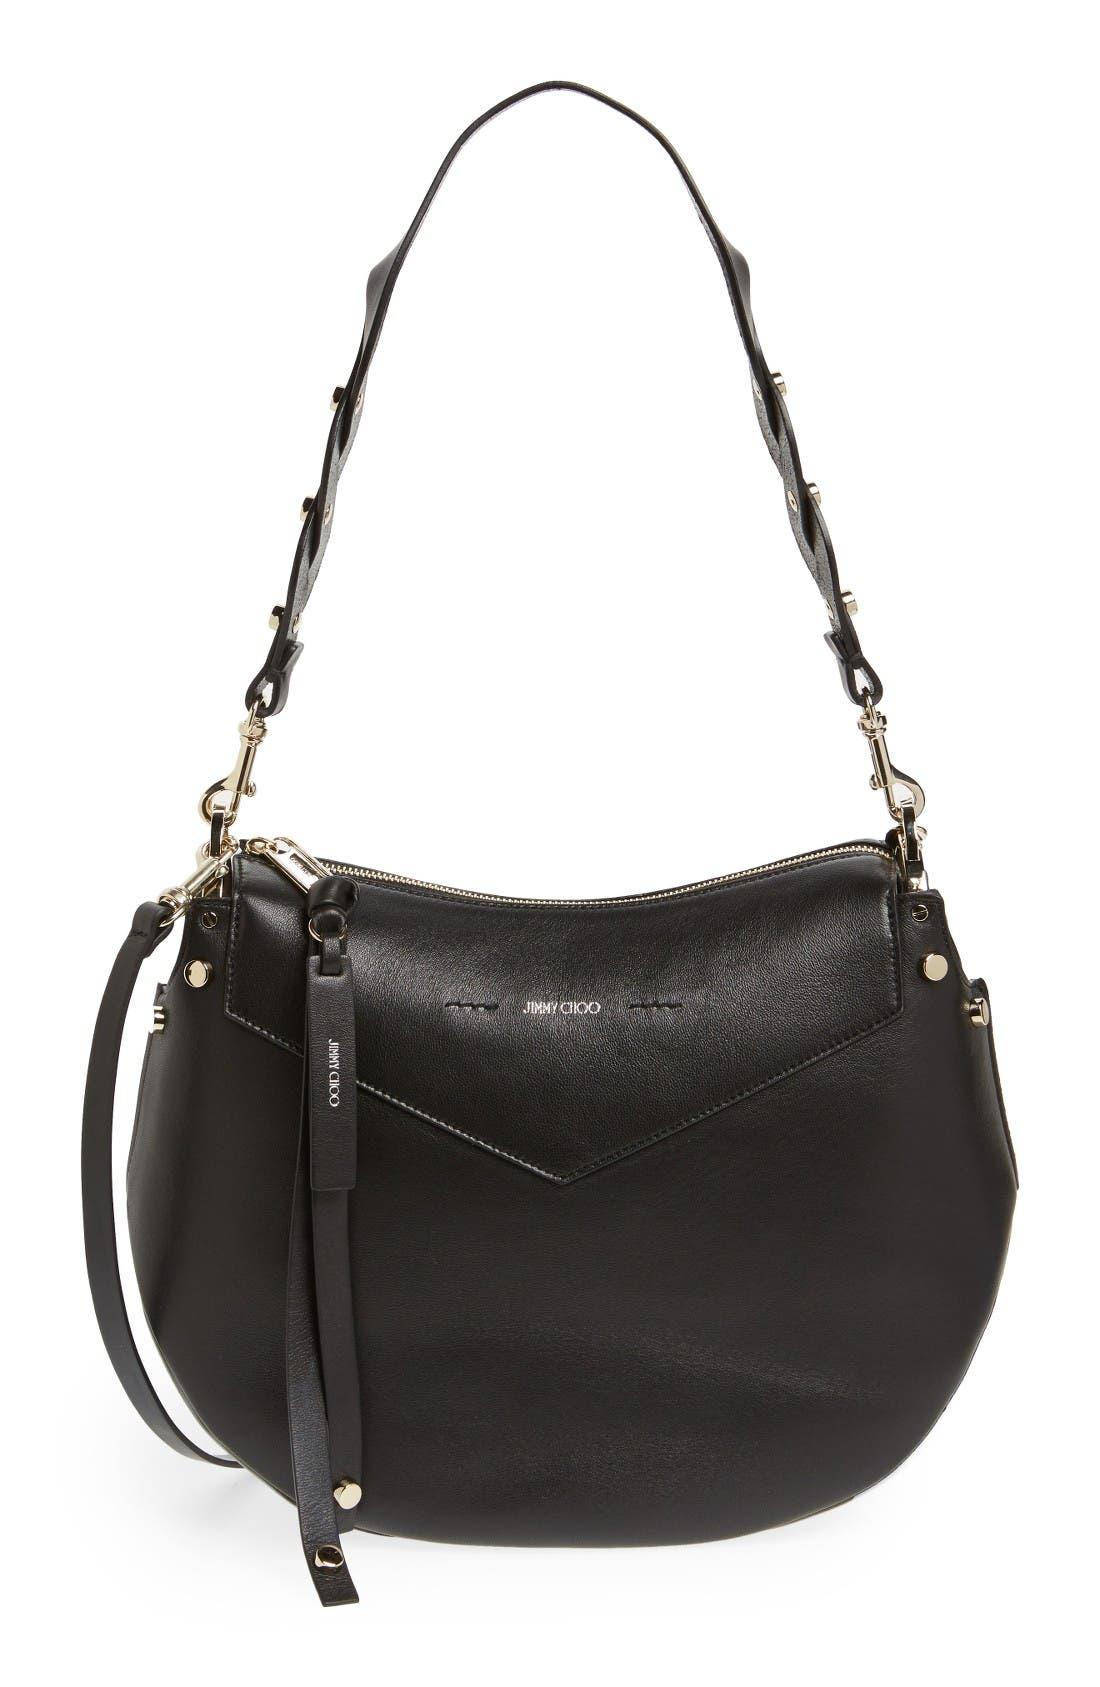 Jimmy Choo Artie Nappa Leather Hobo Bag